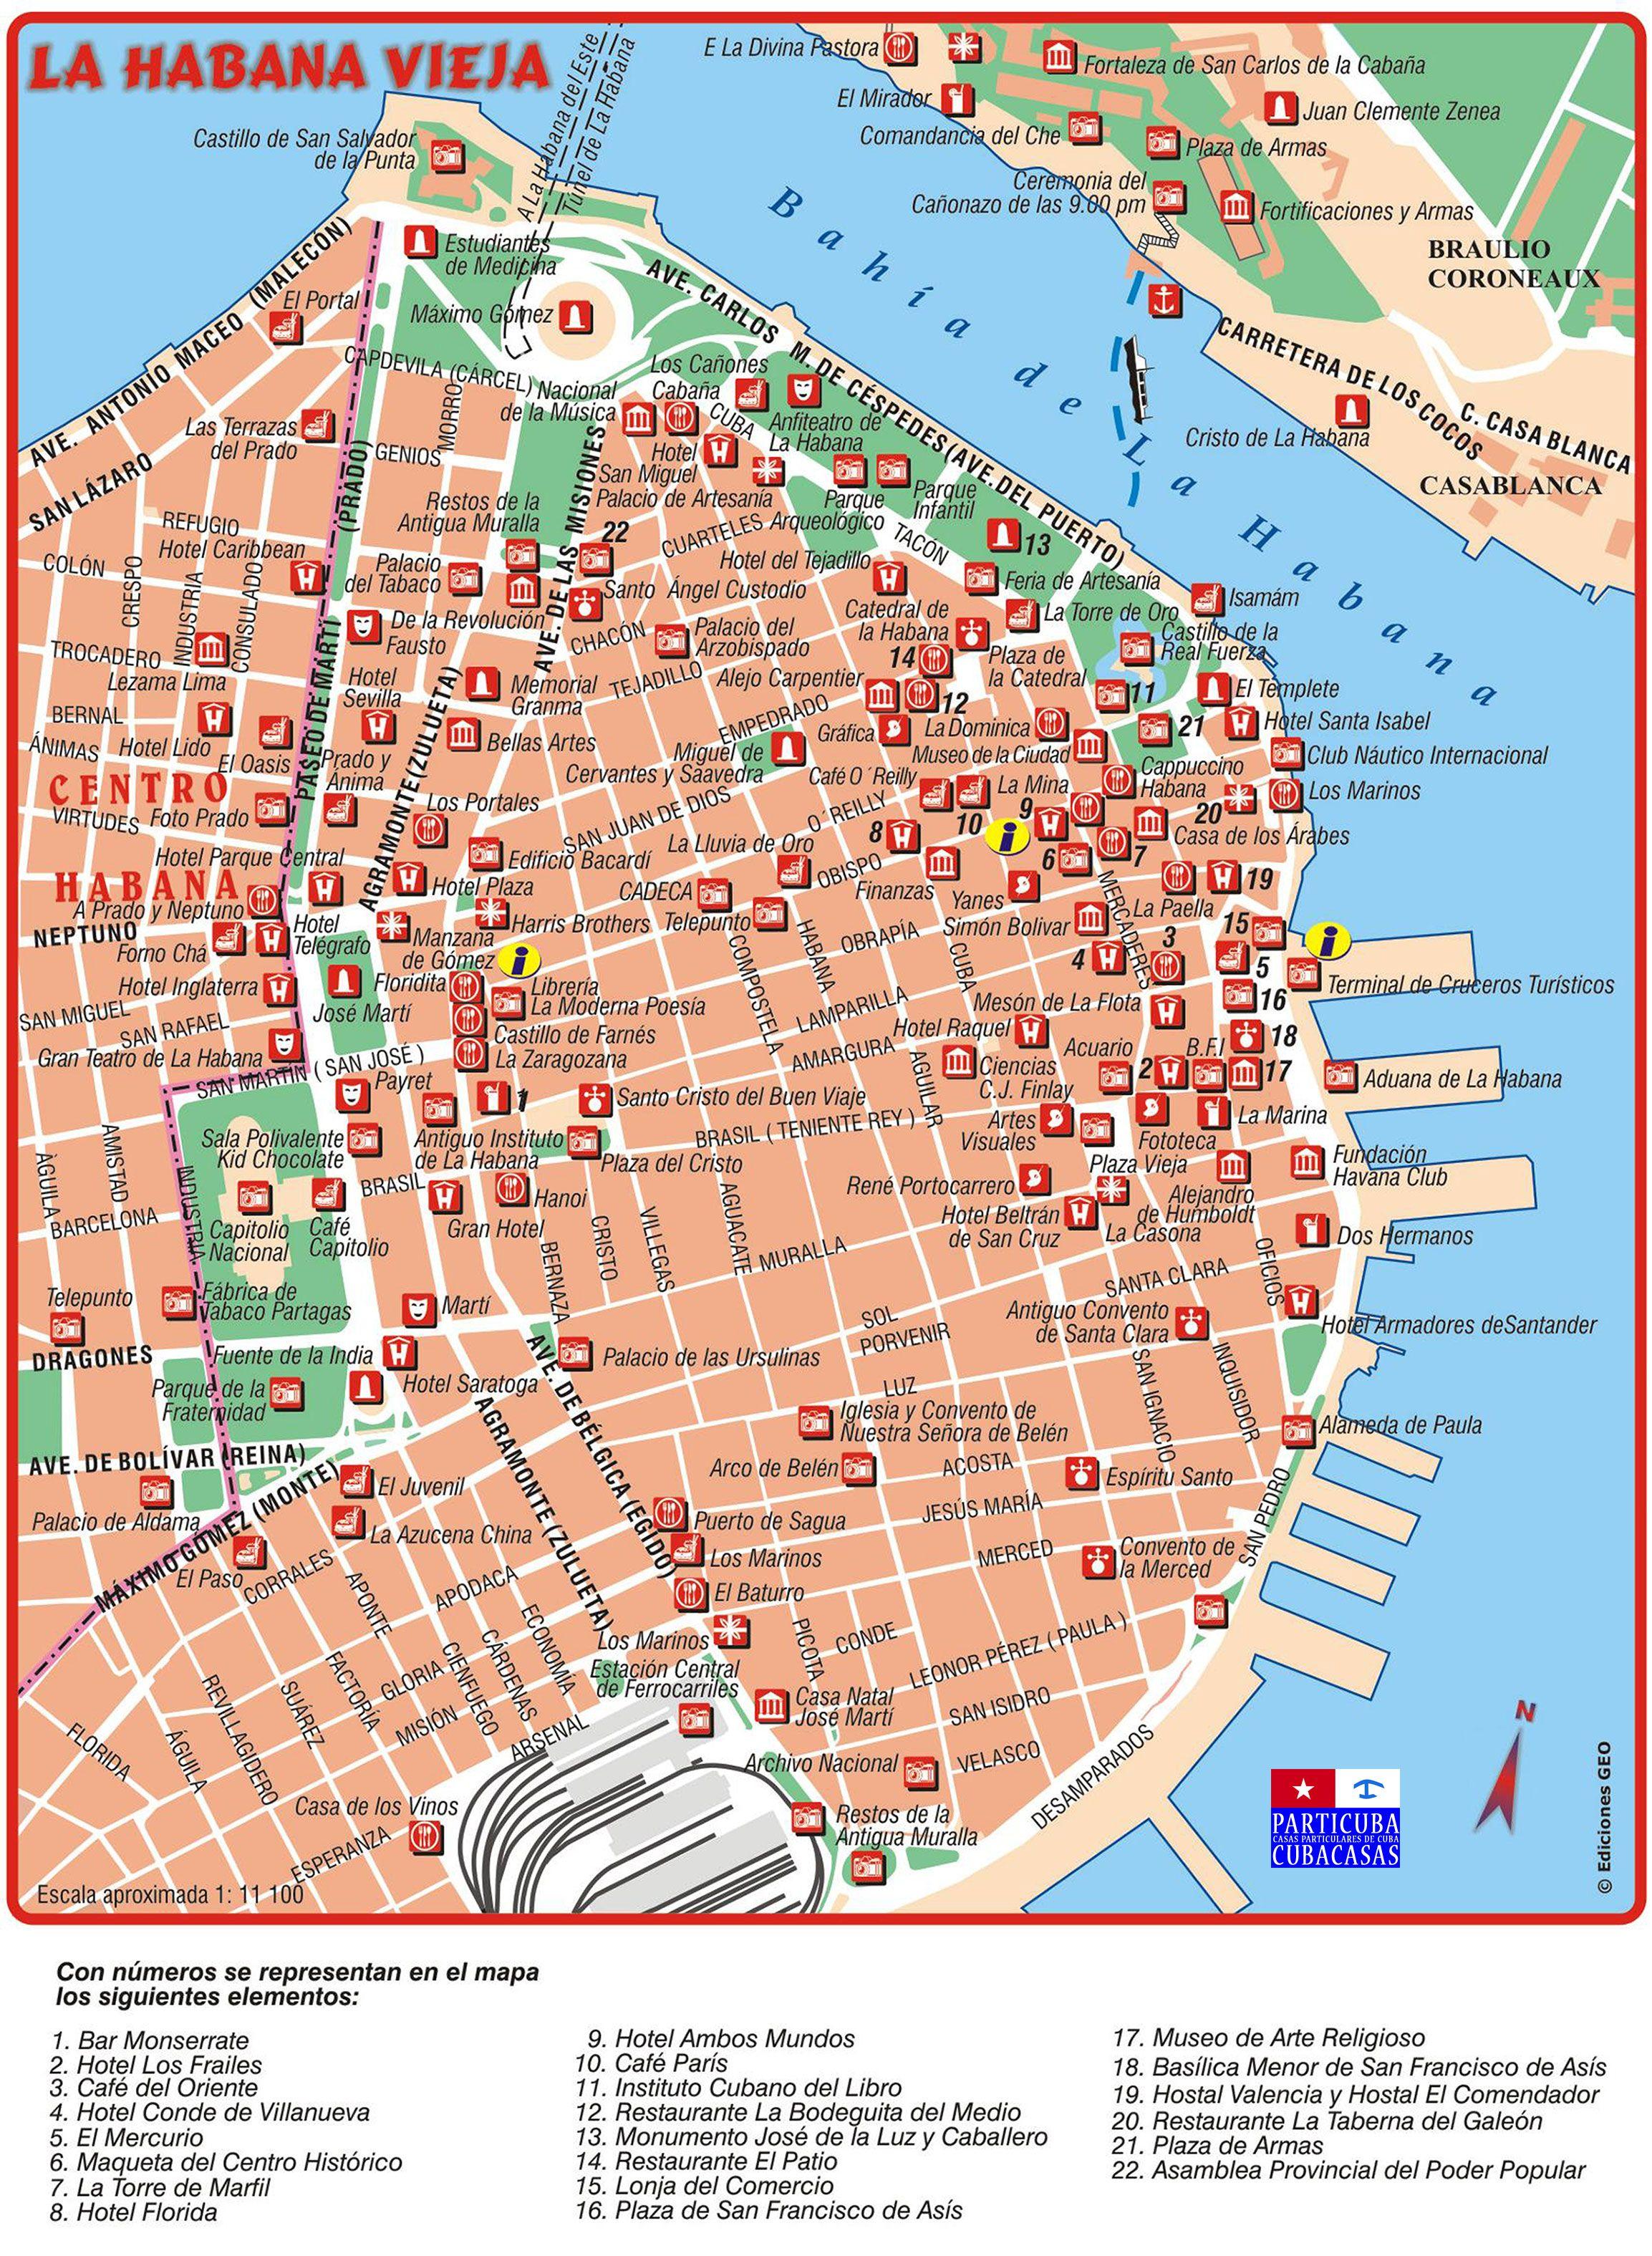 Havanna Kuba Karte.Habana Vieja Www Particuba Net Kuba Kuba Und Havanna